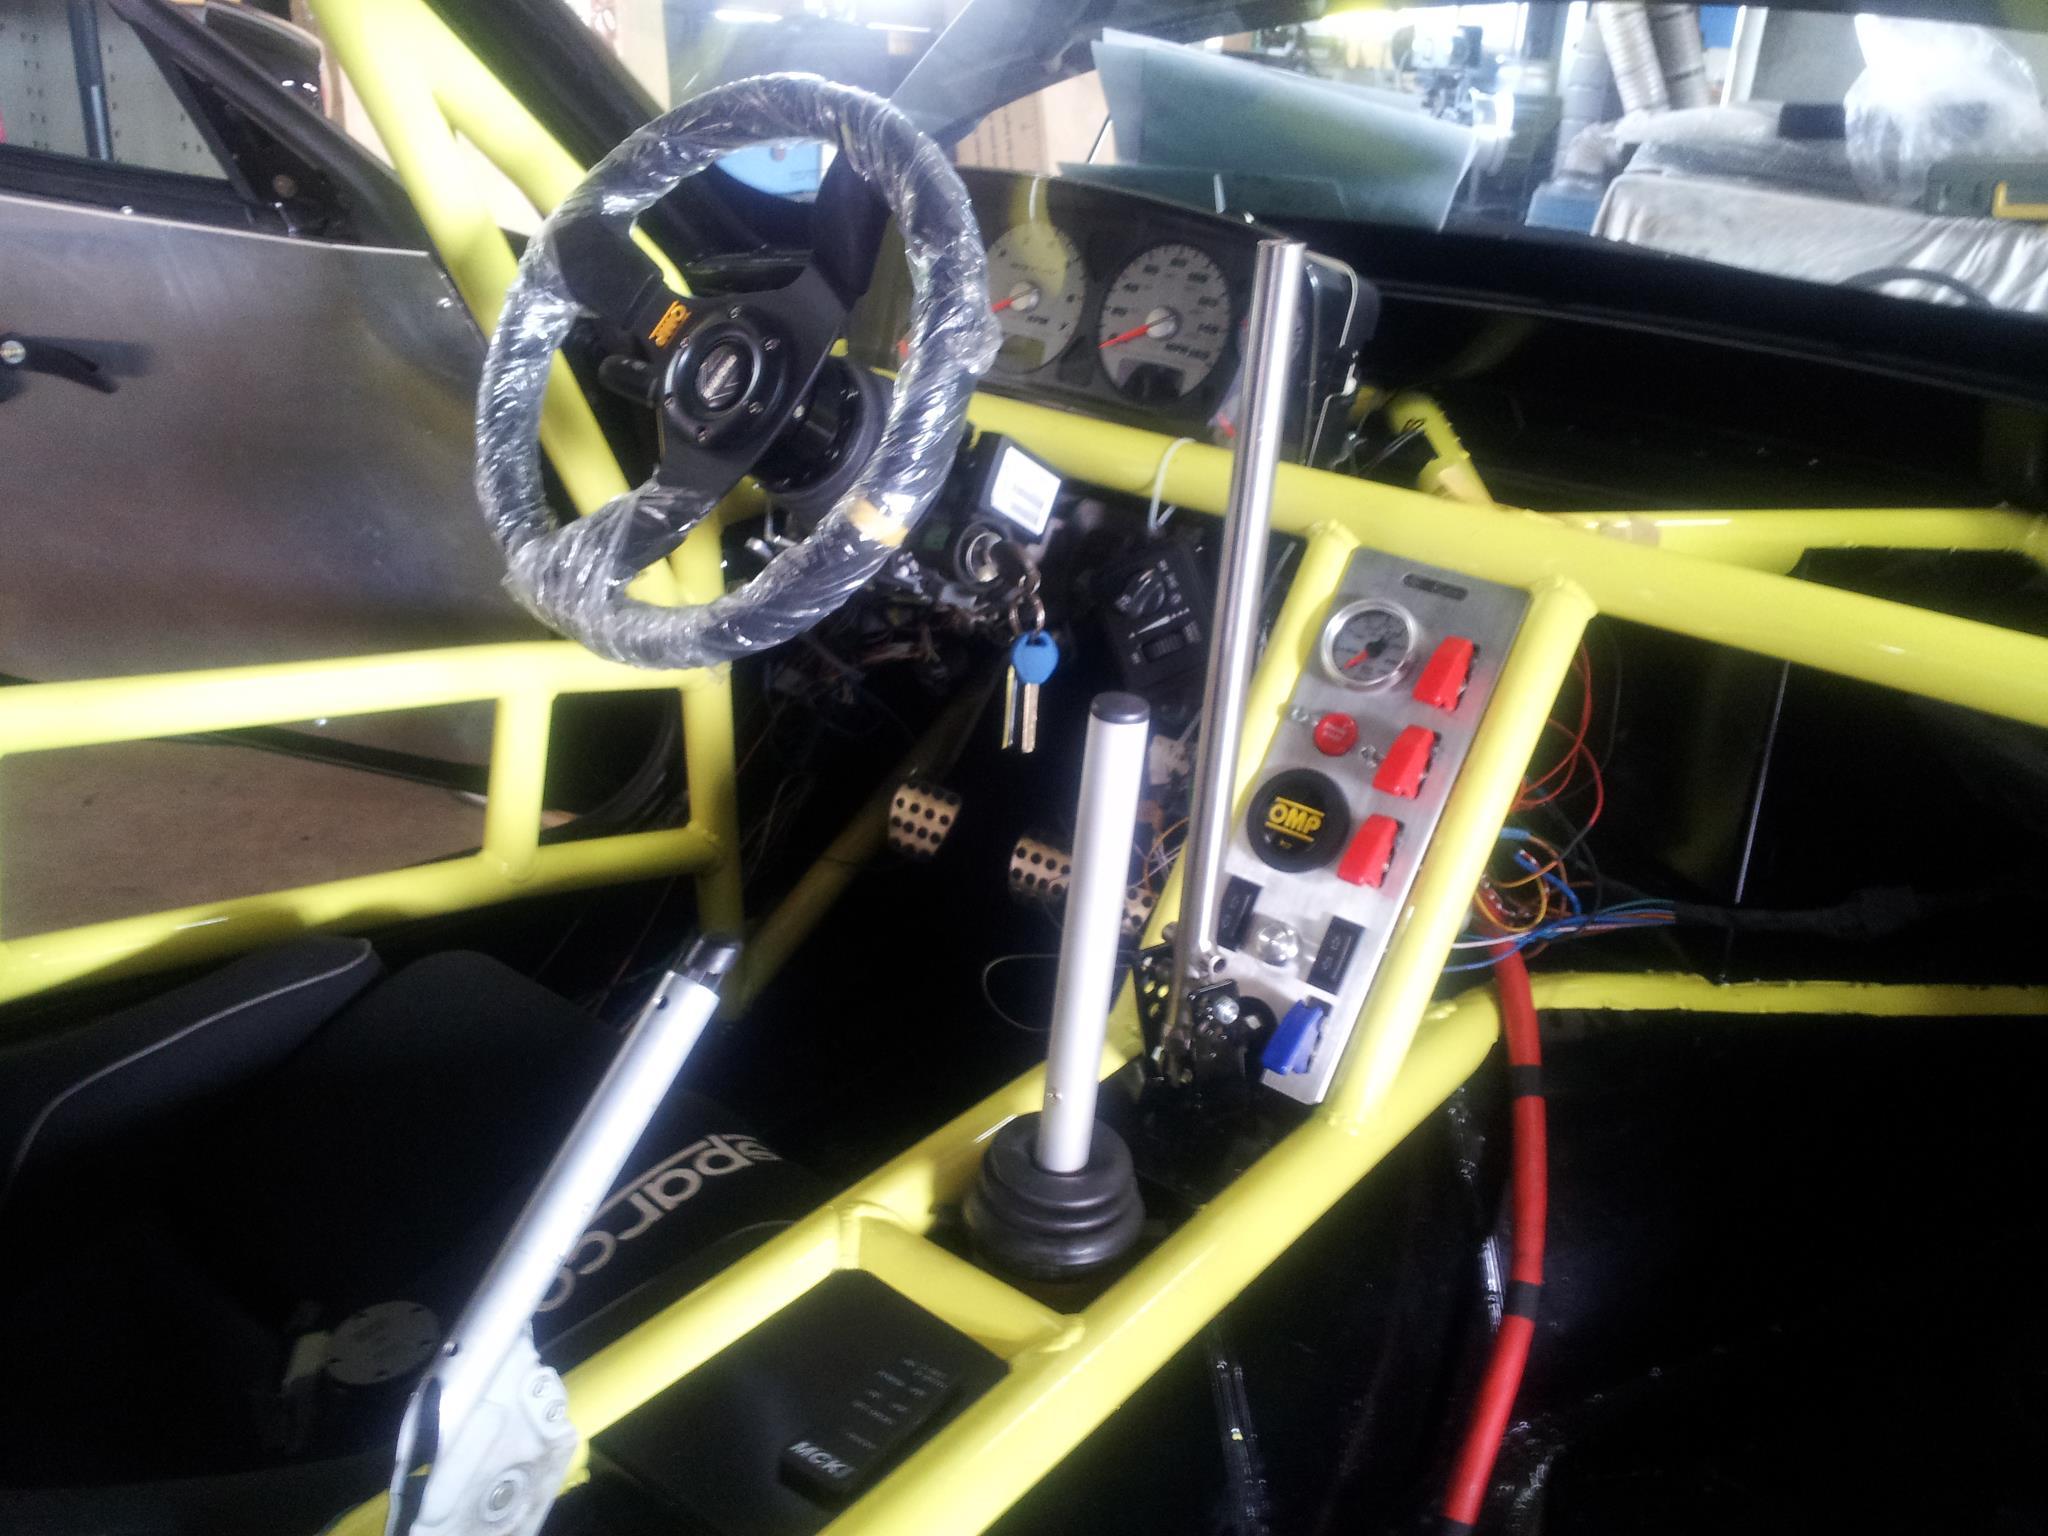 Bmw Z4 With A Dodge Srt 10 V10 Update Engine Swap Depot Wiring Harness Viper